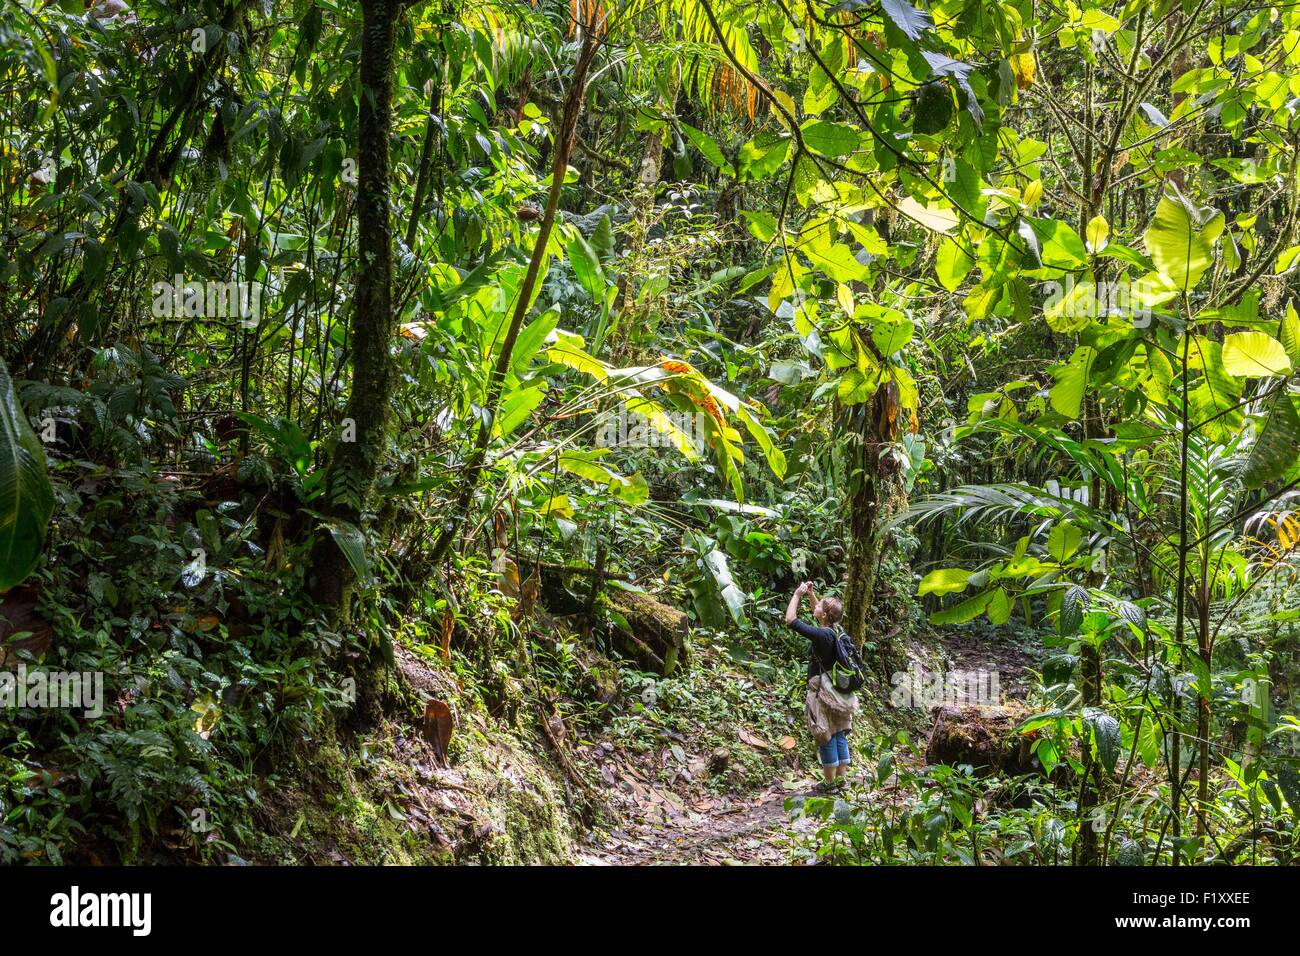 Costa Rica, Puntarenas province, Monteverde Cloud Forest, Reserva Biologica del Bosque (biological reserve of the Stock Photo